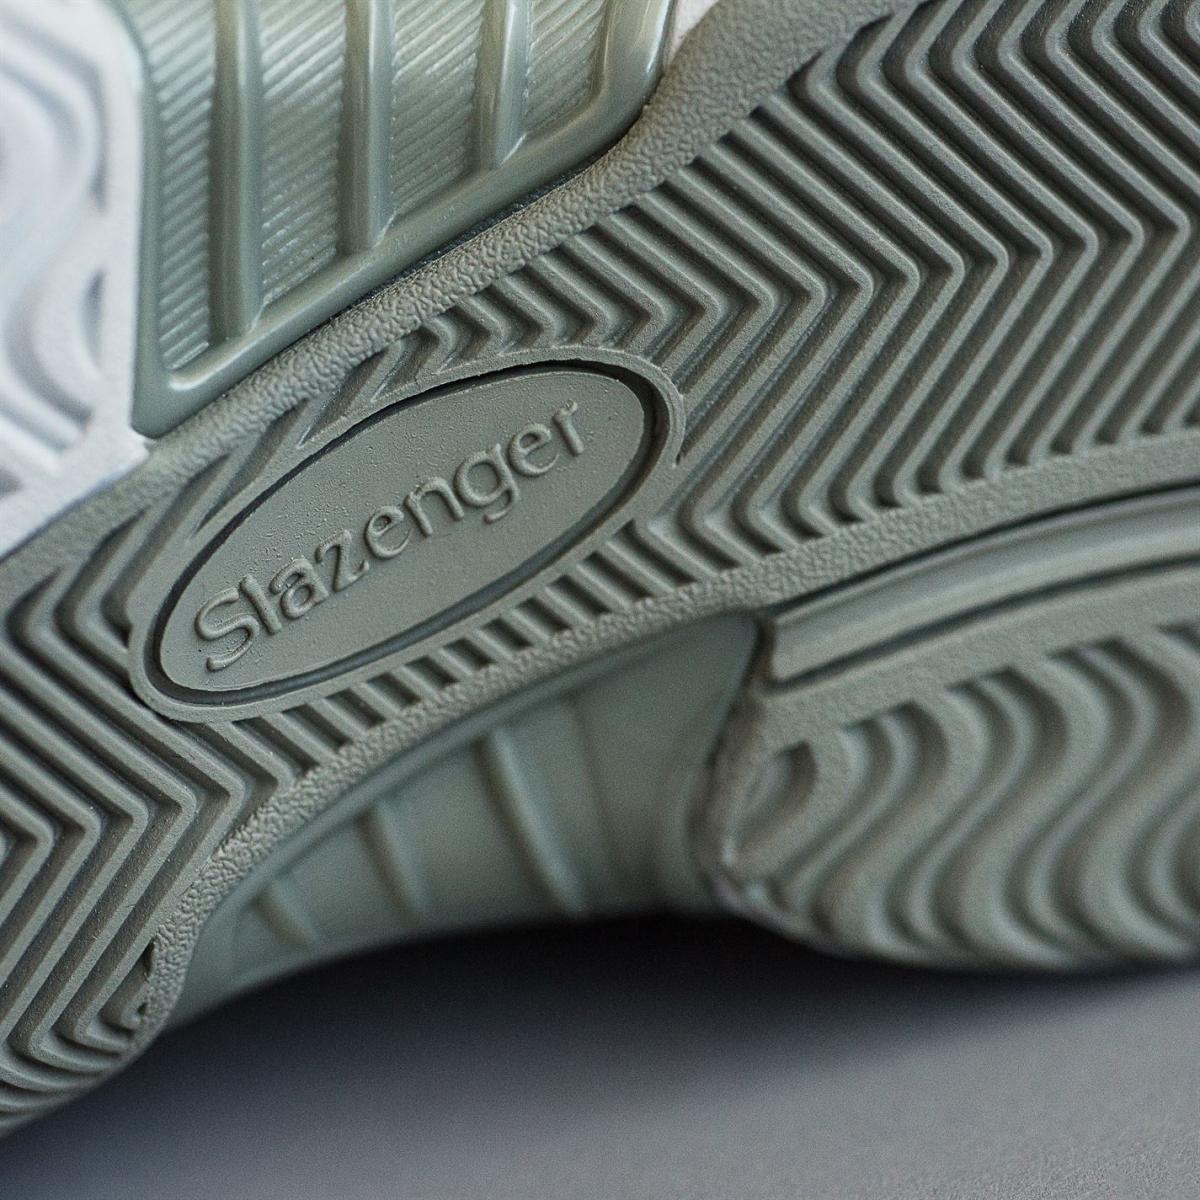 Slazenger-Turnschuhe-Laufschuhe-Damen-Sportschuhe-Sneakers-Lifestyle-6118 Indexbild 10